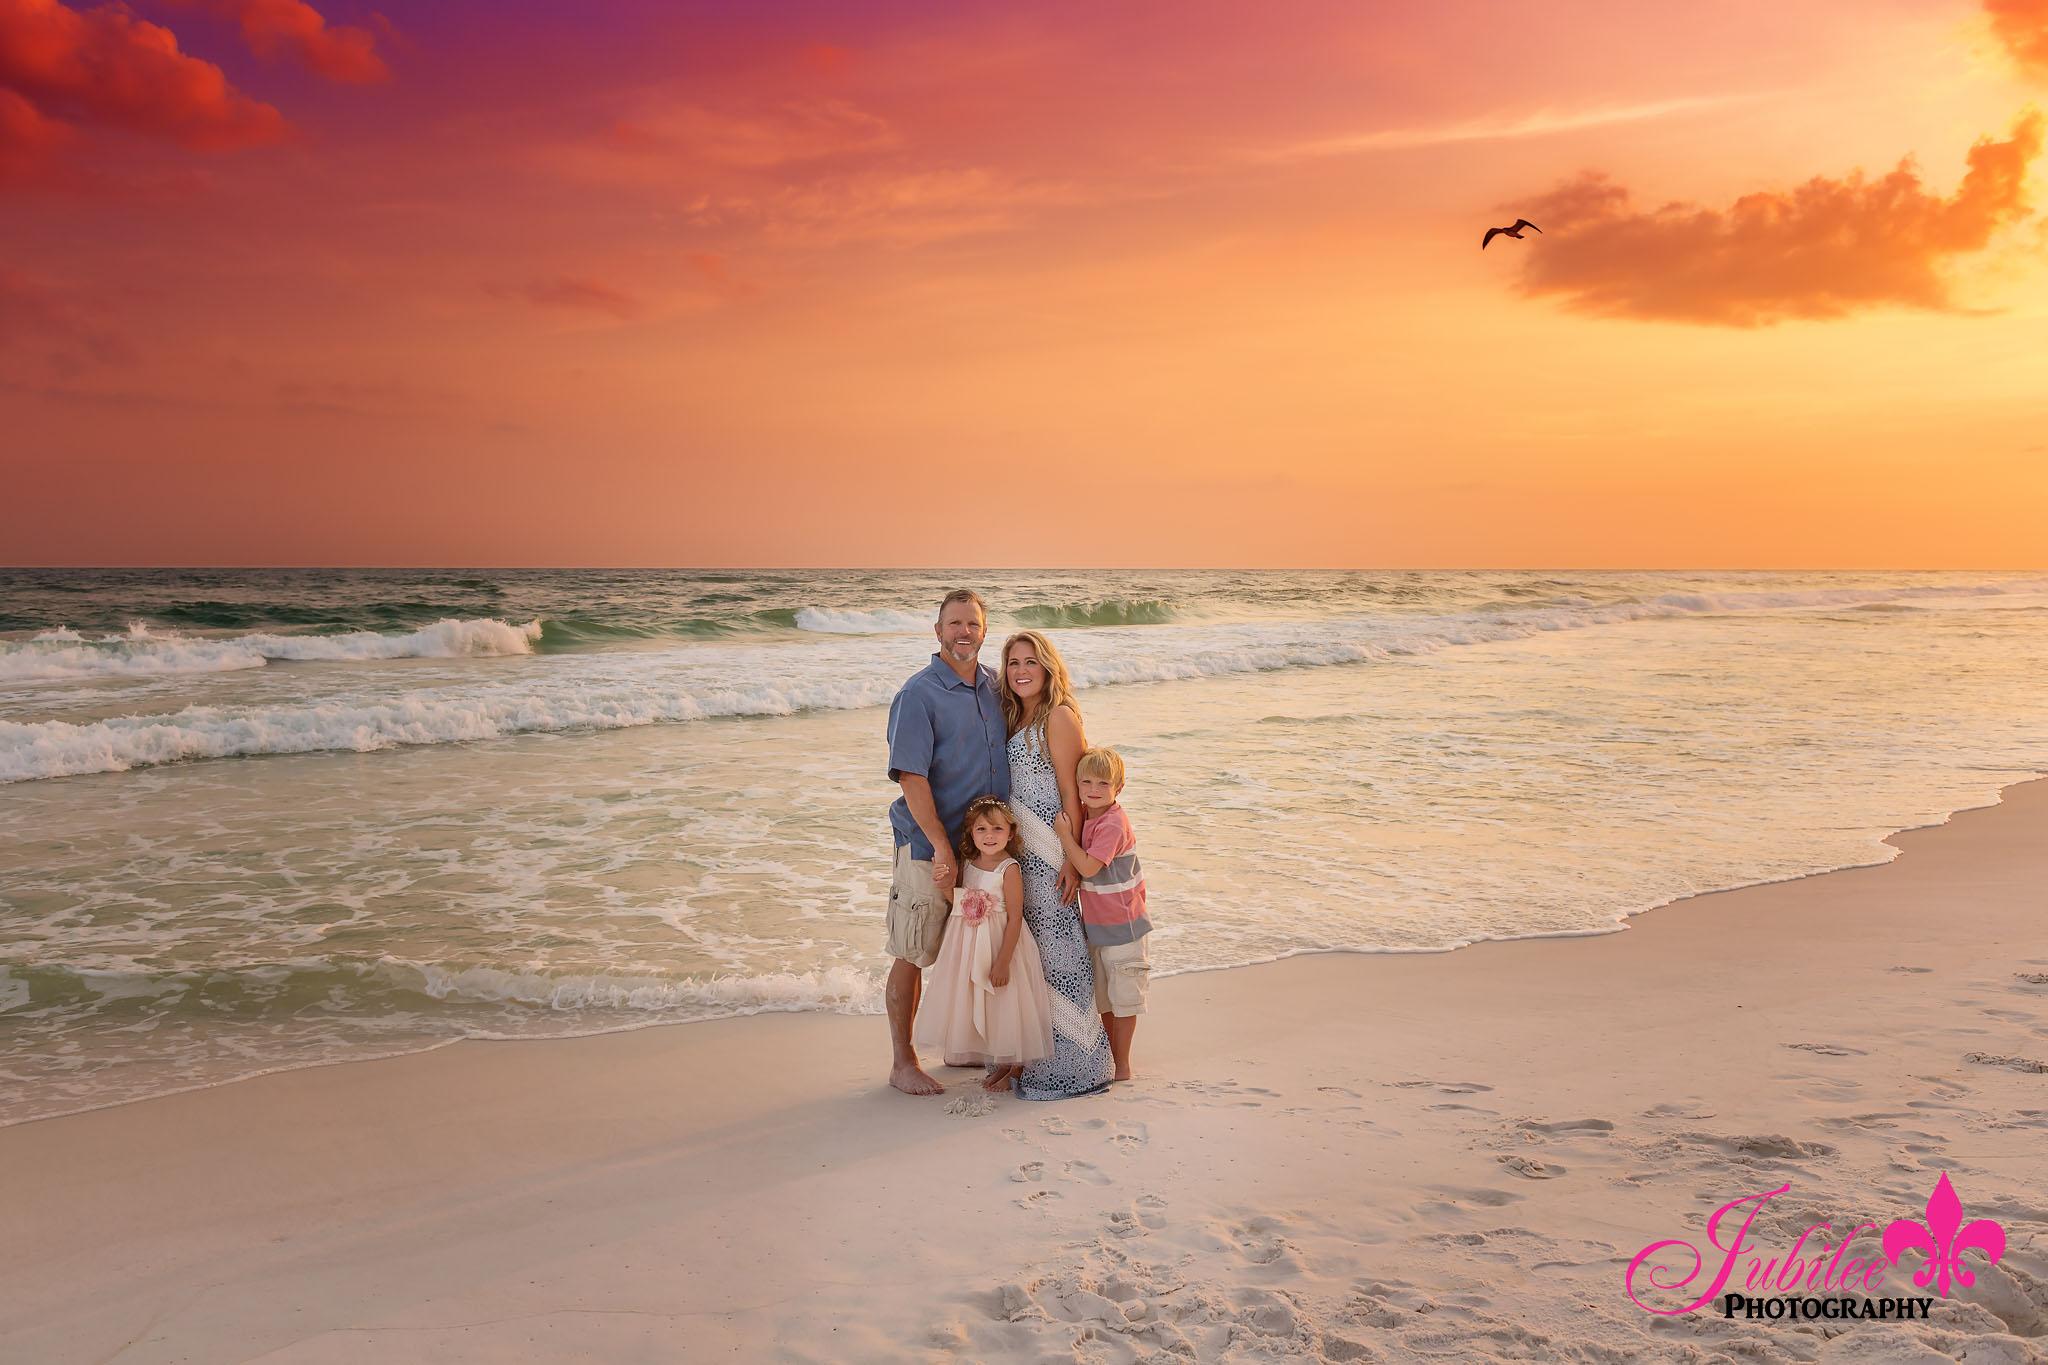 destin_beach_photographer_6200